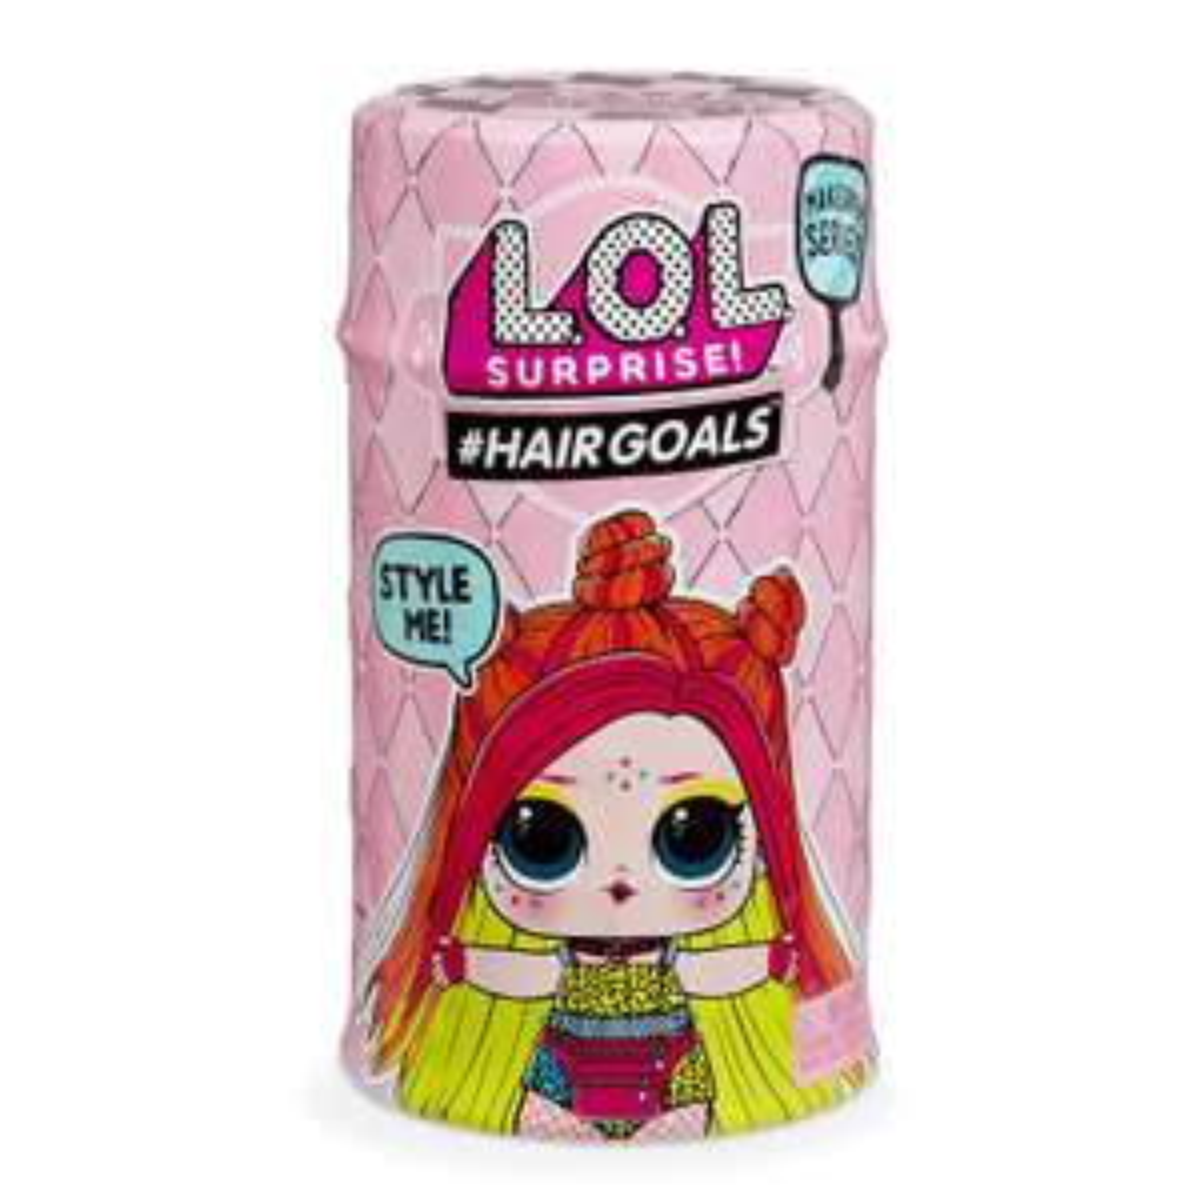 LOL hair goals series 2 £8 @ Morrisons (Walsall)